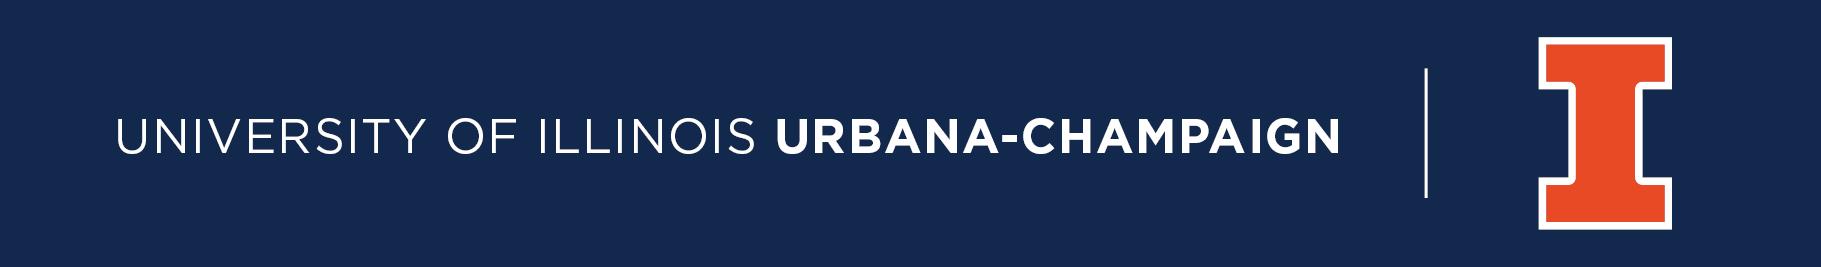 University of Illinois Urbana-Champaign and Block I logo